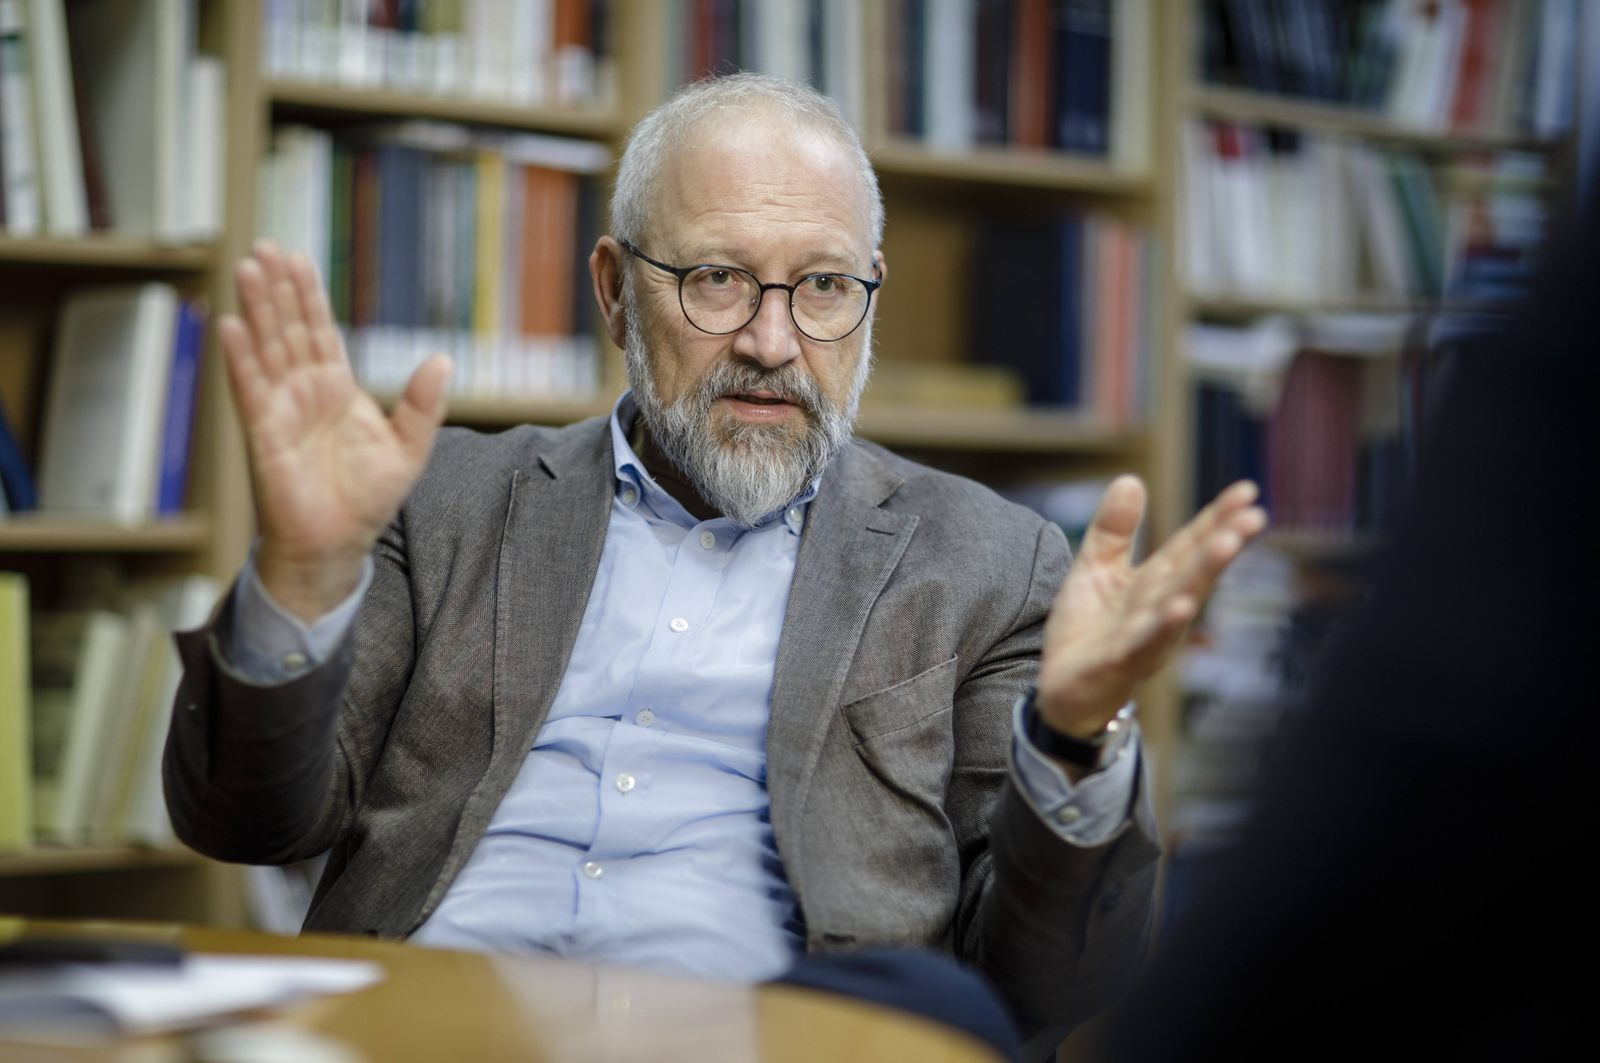 Herfried Muenkler deutscher Politikwissenschaftler gestikuliert waehrend eines Interviews Berlin